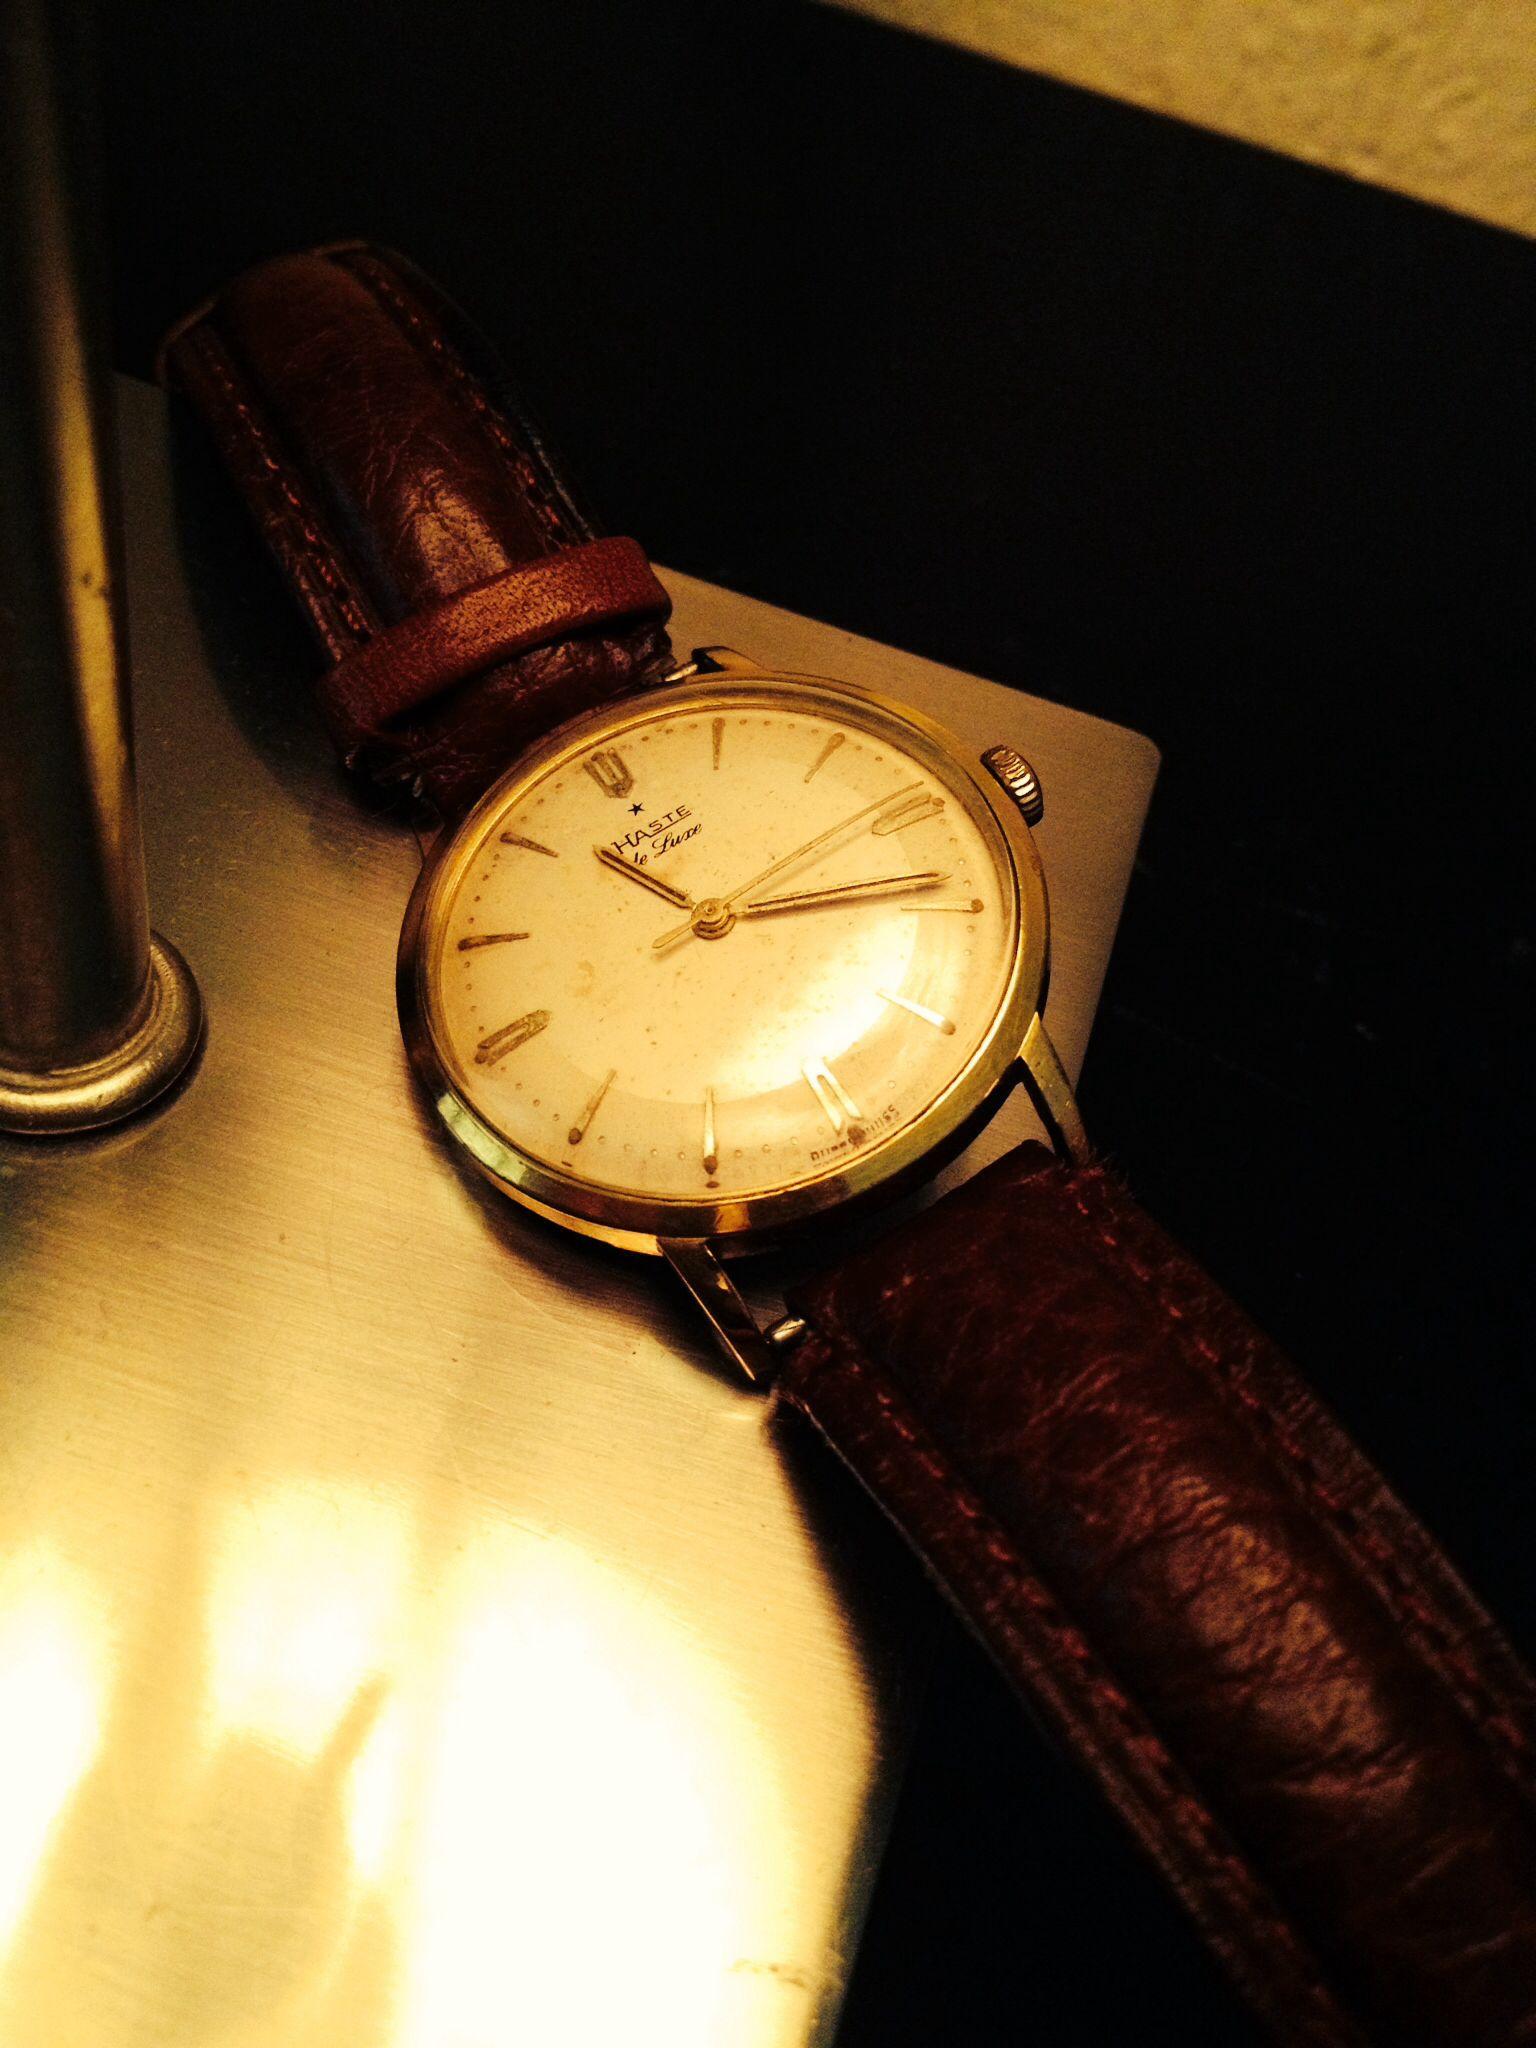 Reloj Steelco Jewels Original Clasf